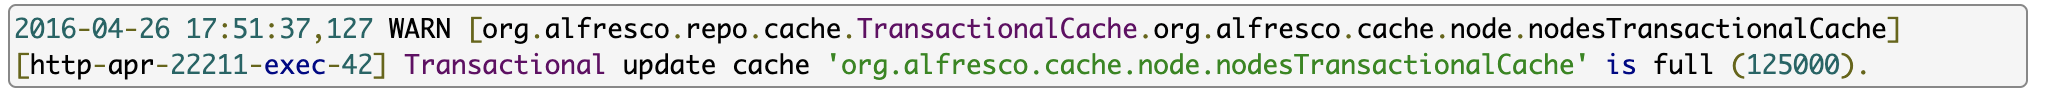 do-i-need-to-increase-my-cache-values